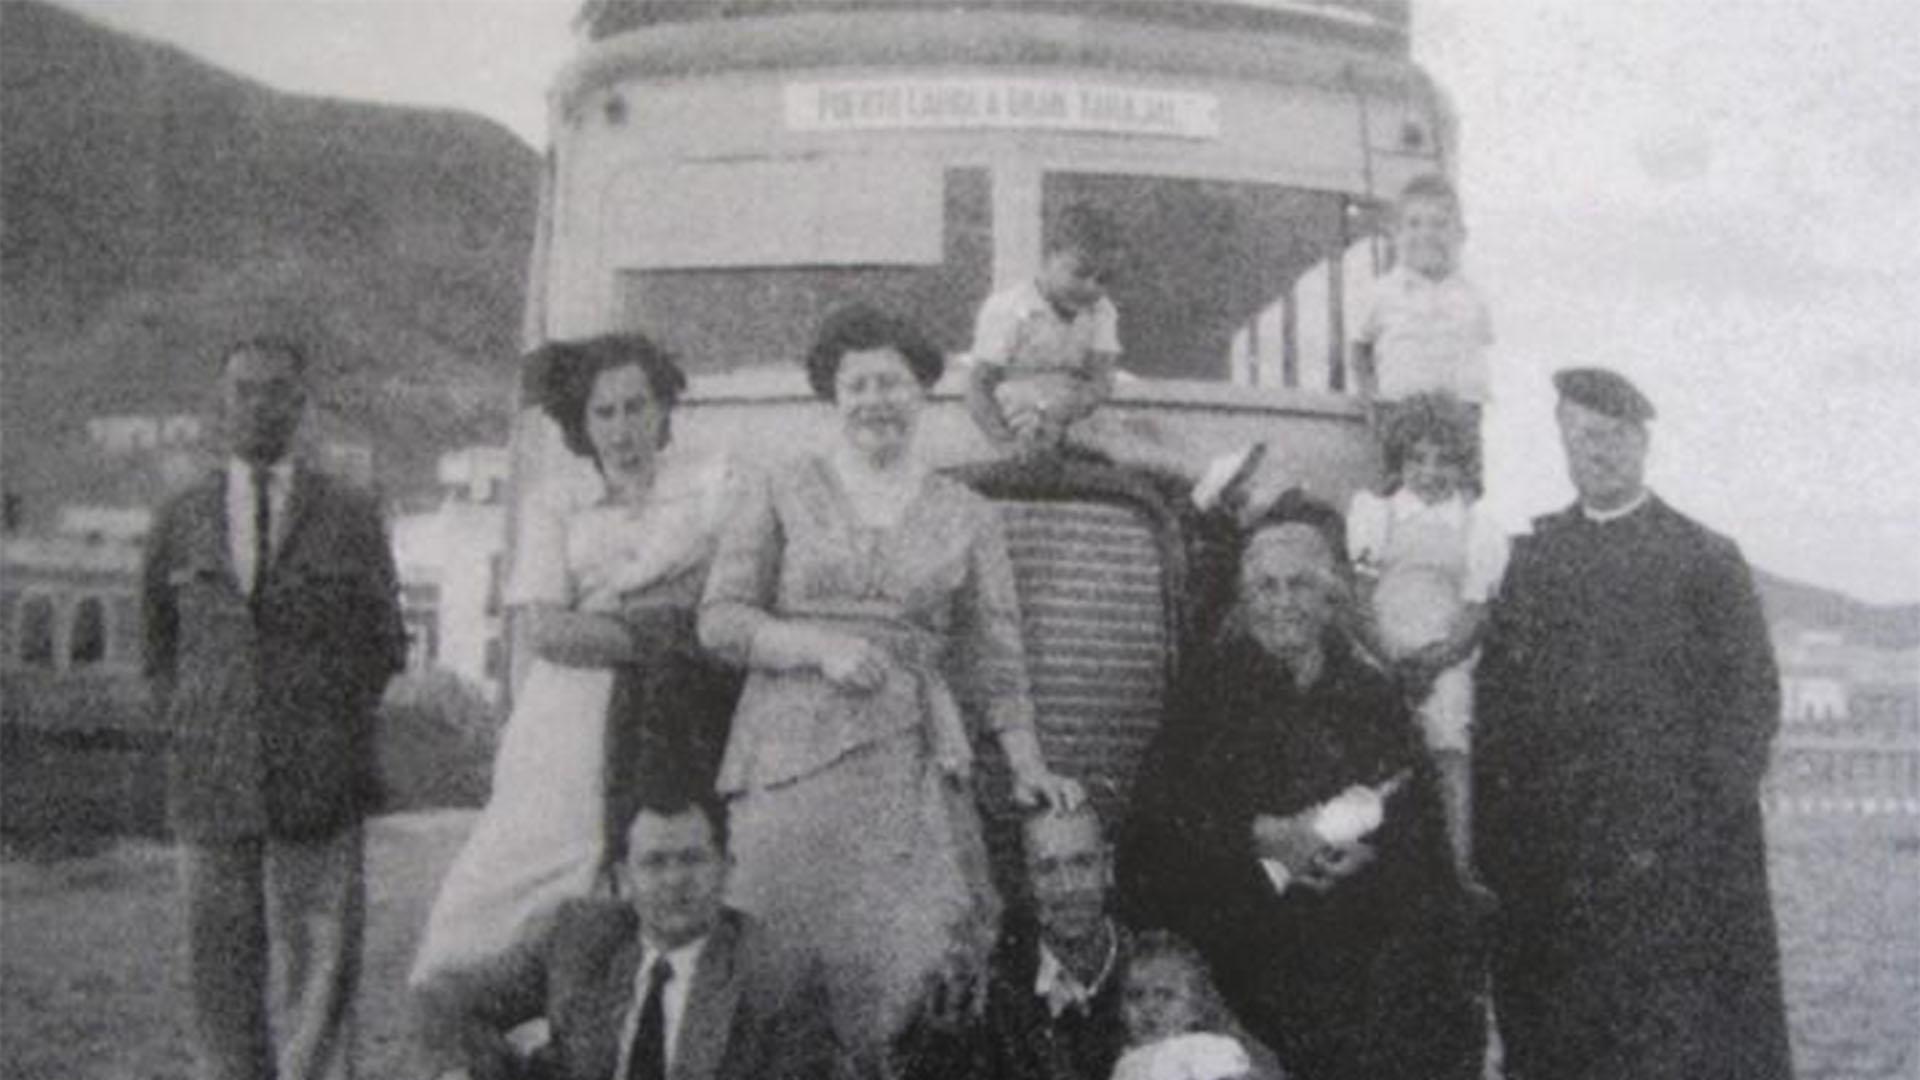 Der Ort Gran Tarajal: Der erste Bus von Fuerteventura Puerto del Rosario –Gran Tarajal.